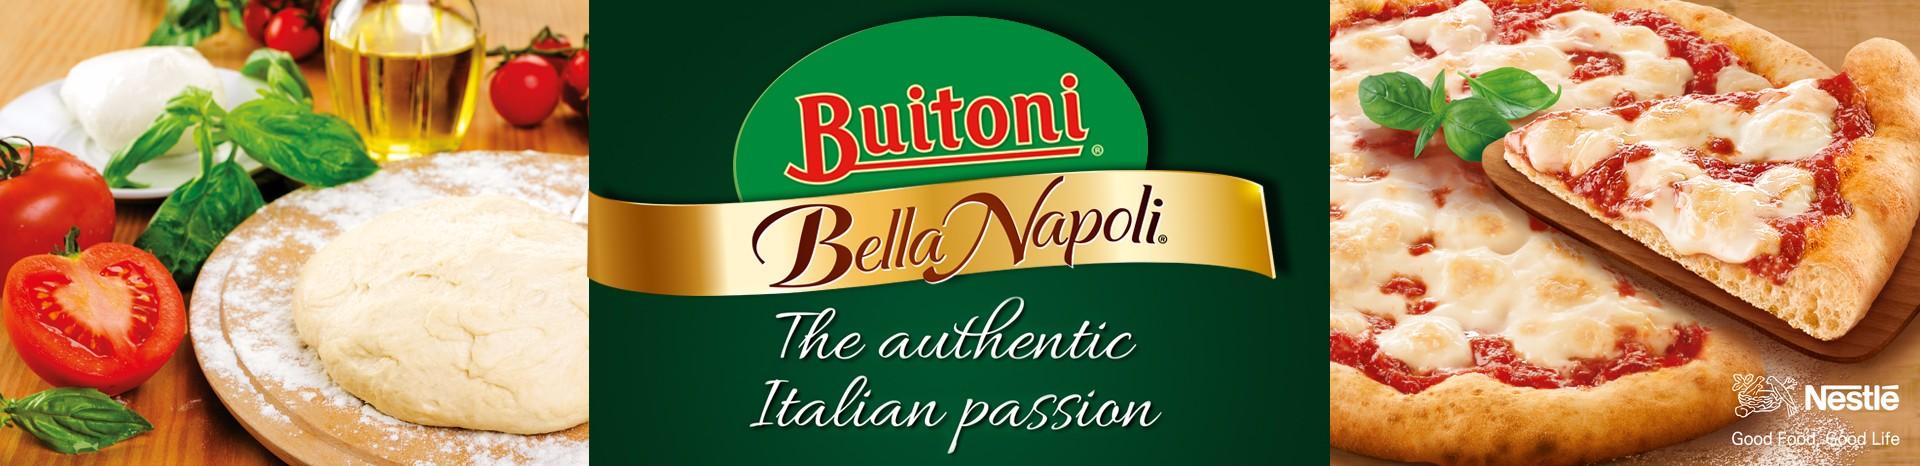 Banner_Buitoni